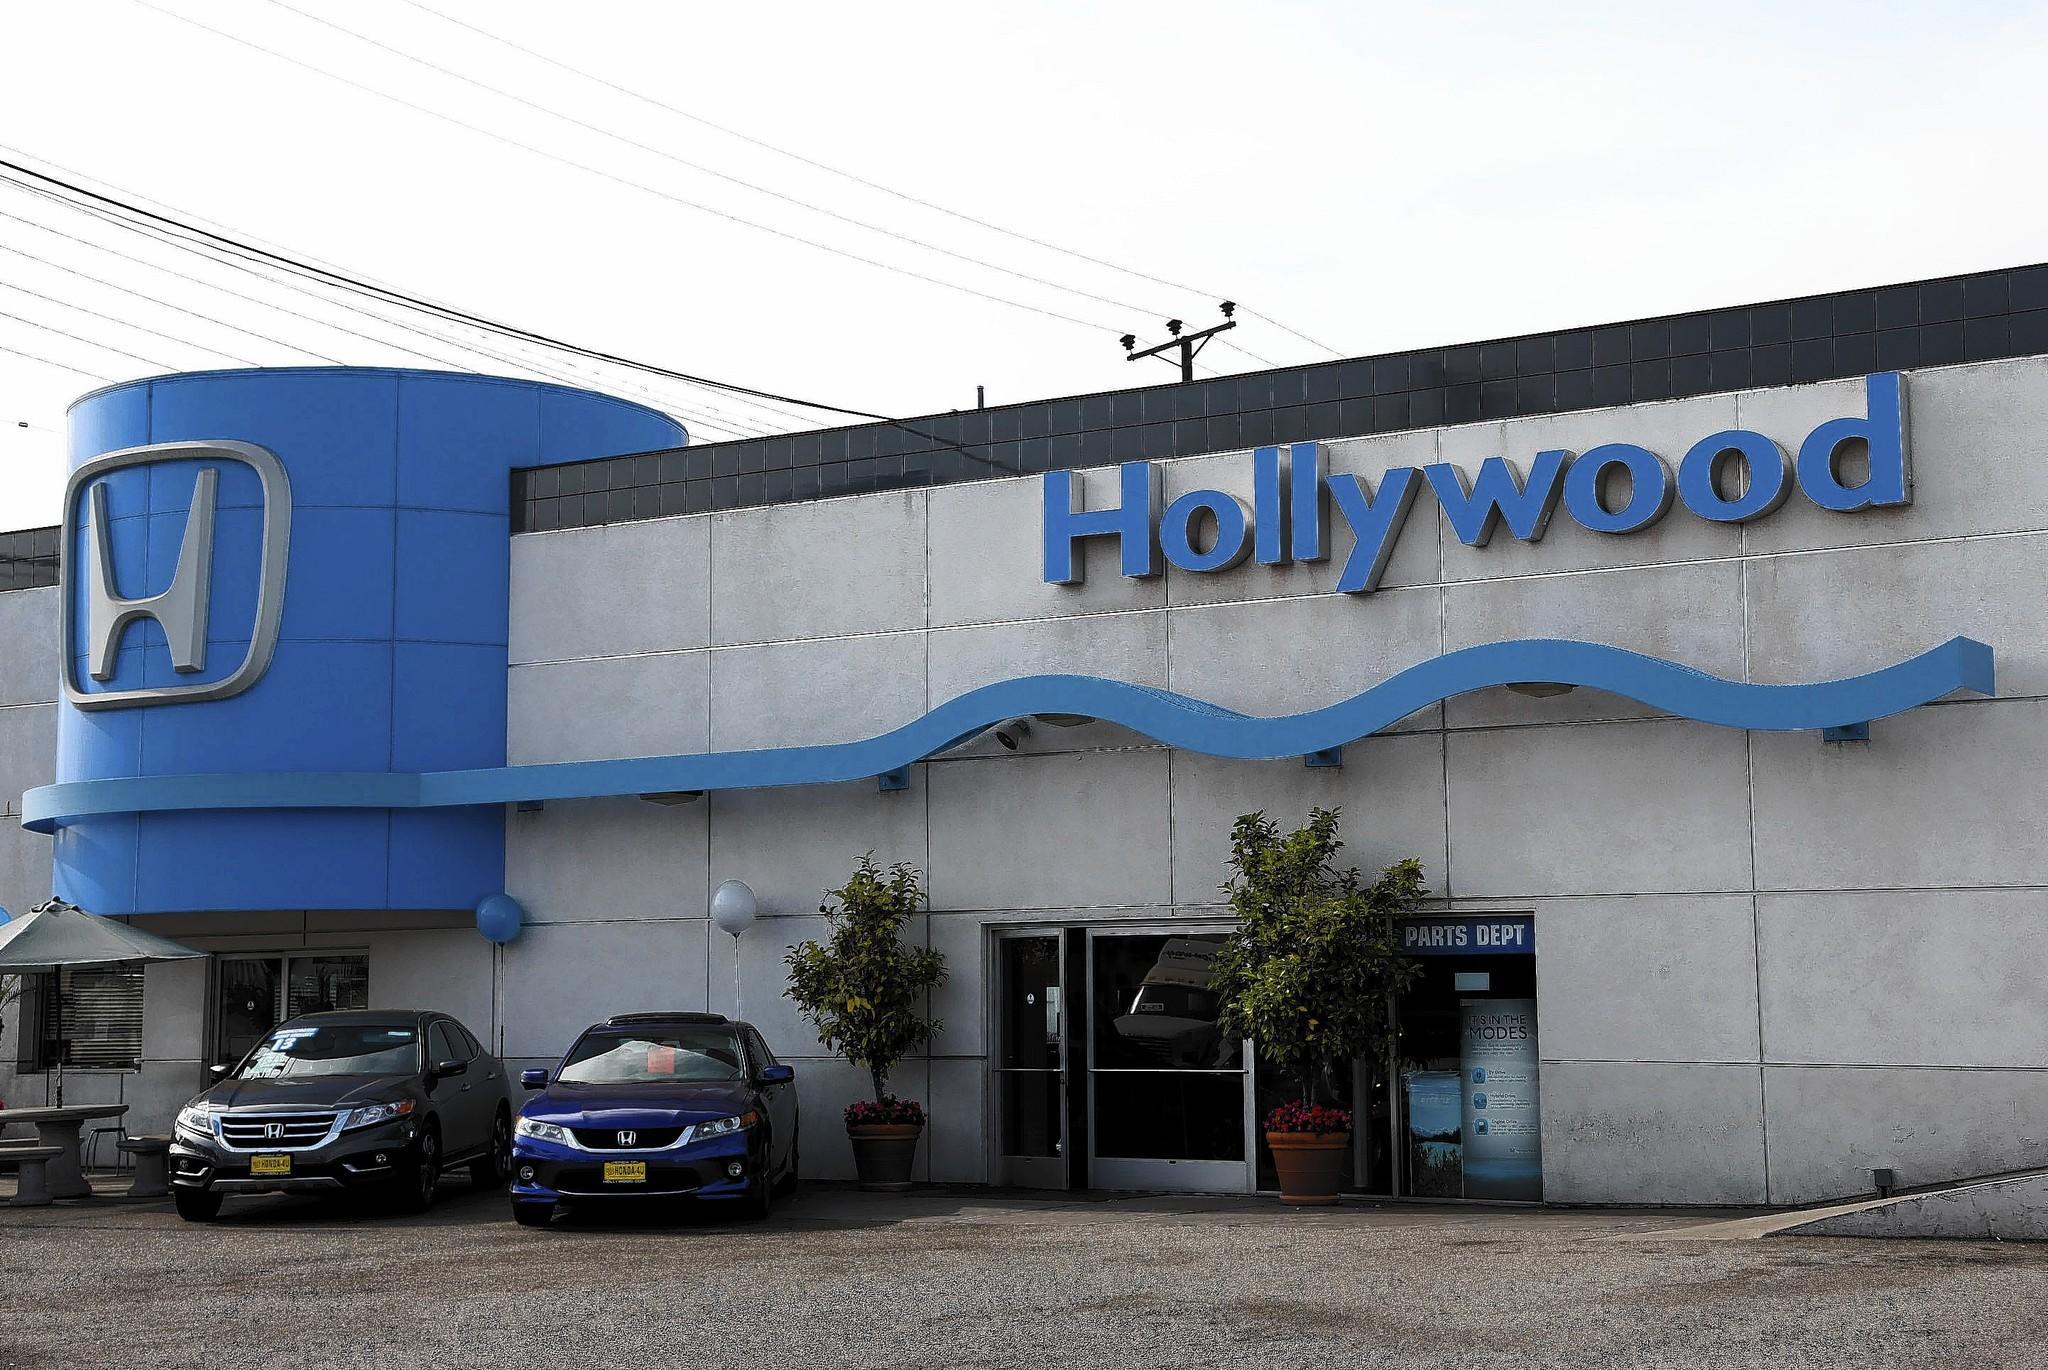 four southland car dealerships settle ftc accusations of deception latimes. Black Bedroom Furniture Sets. Home Design Ideas